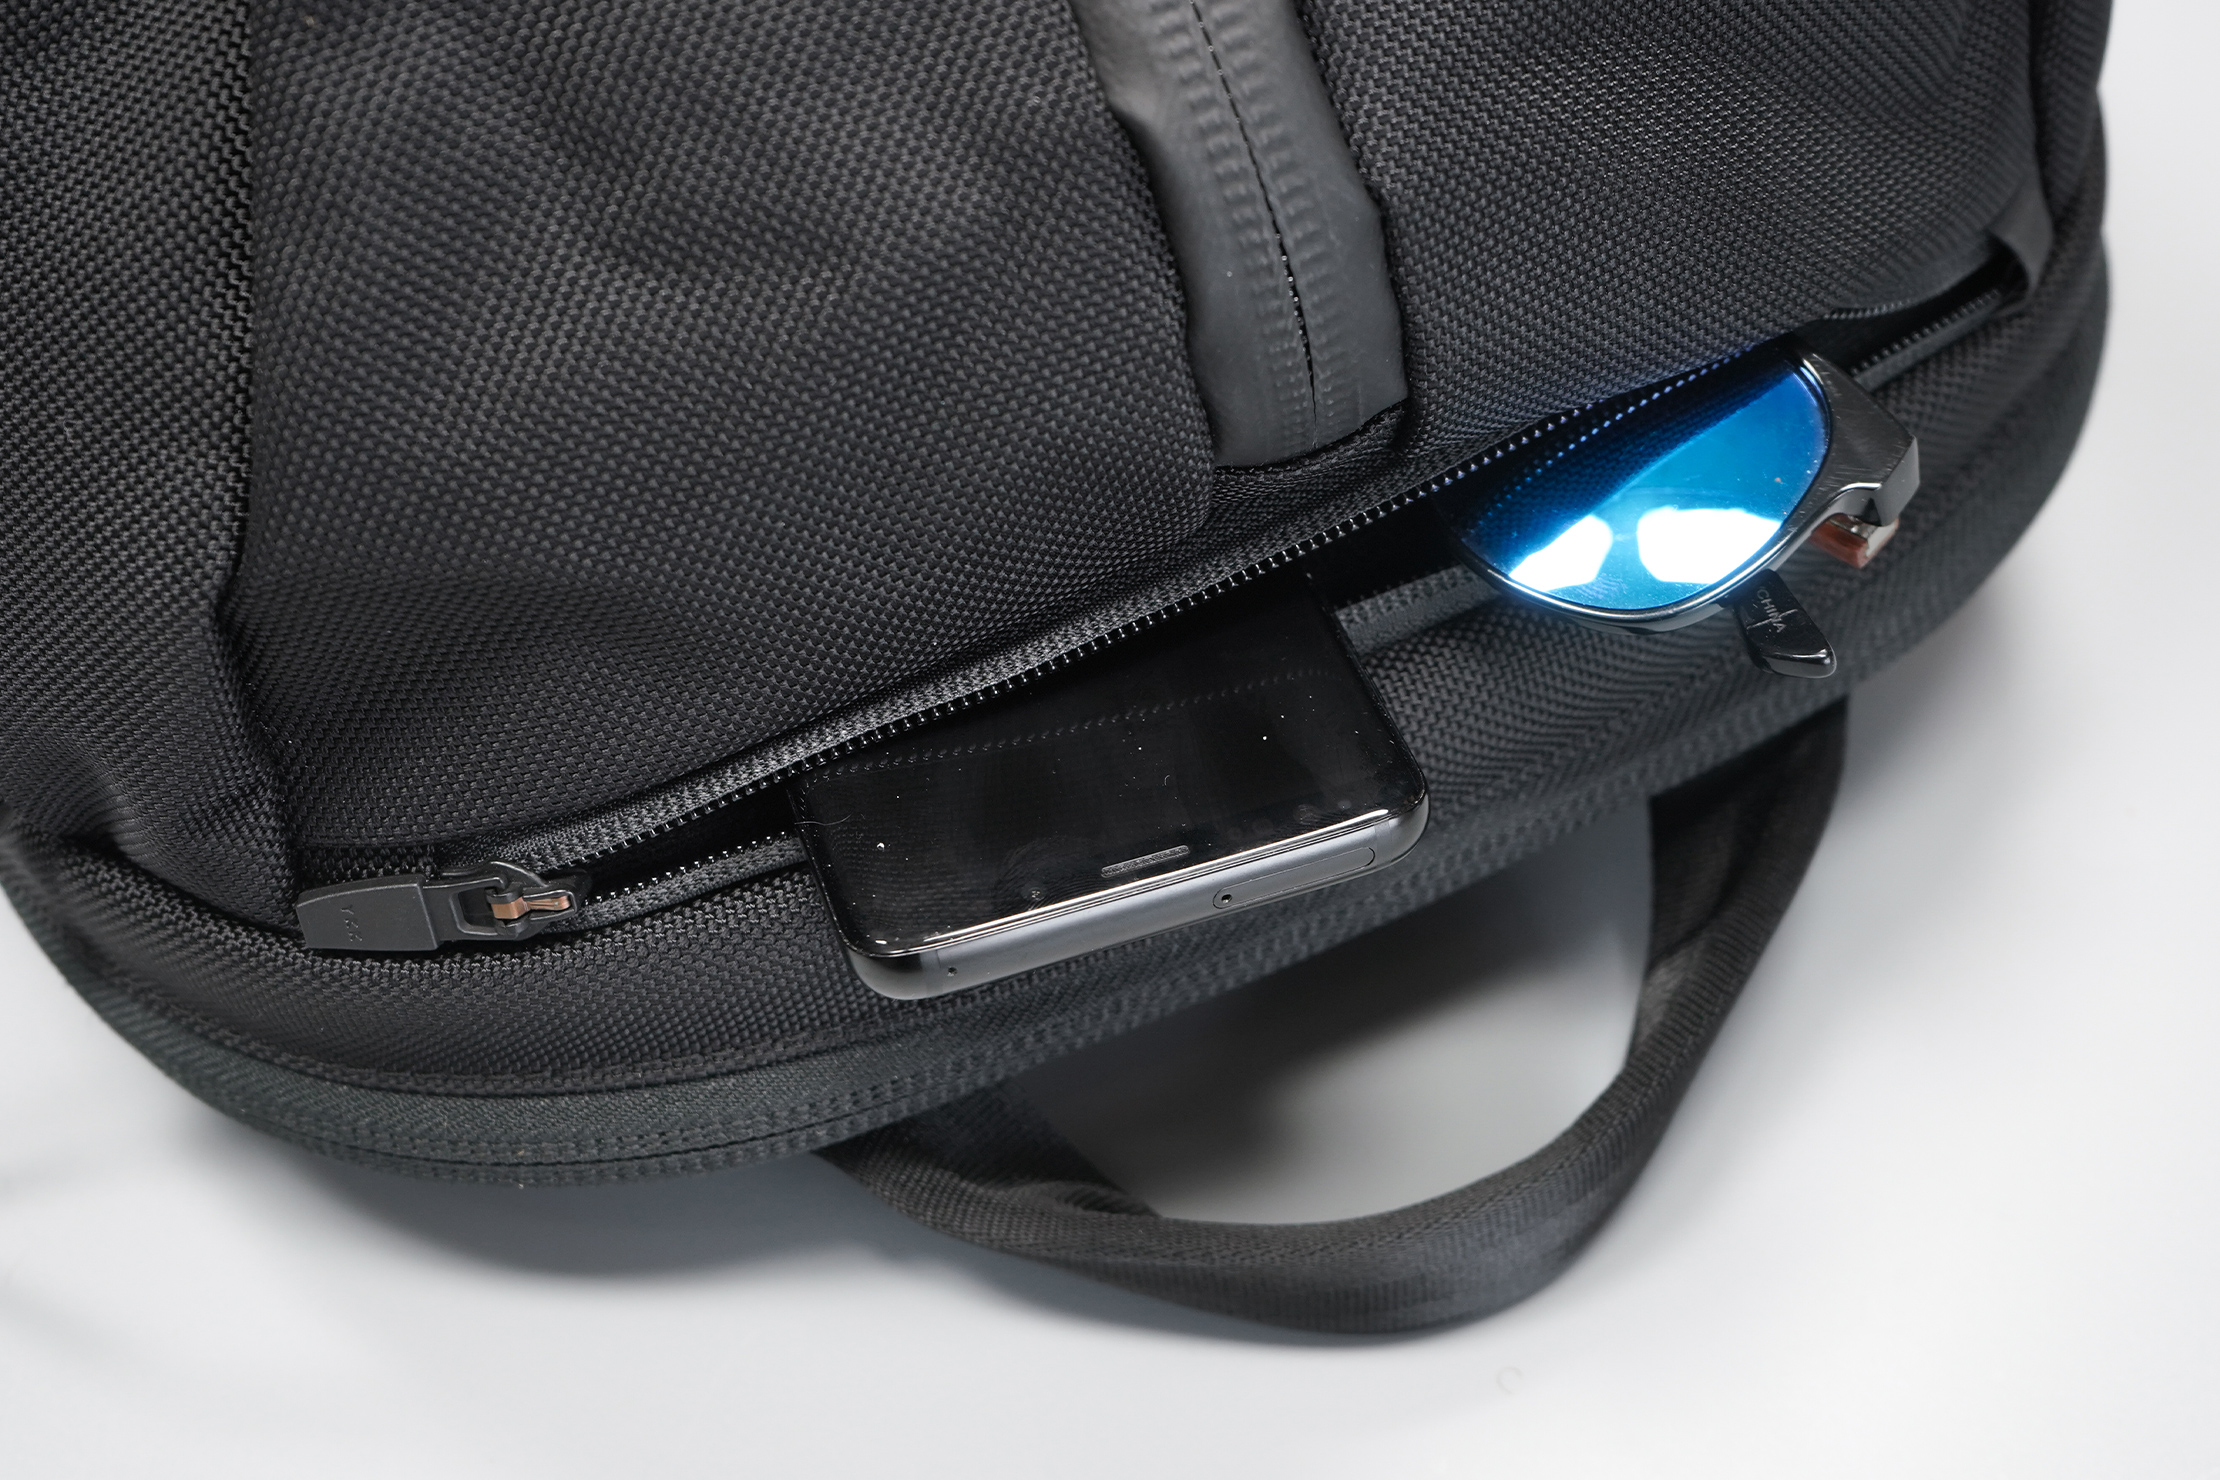 Aer Duffel Pack 3 | Top quick-grab pocket & handle